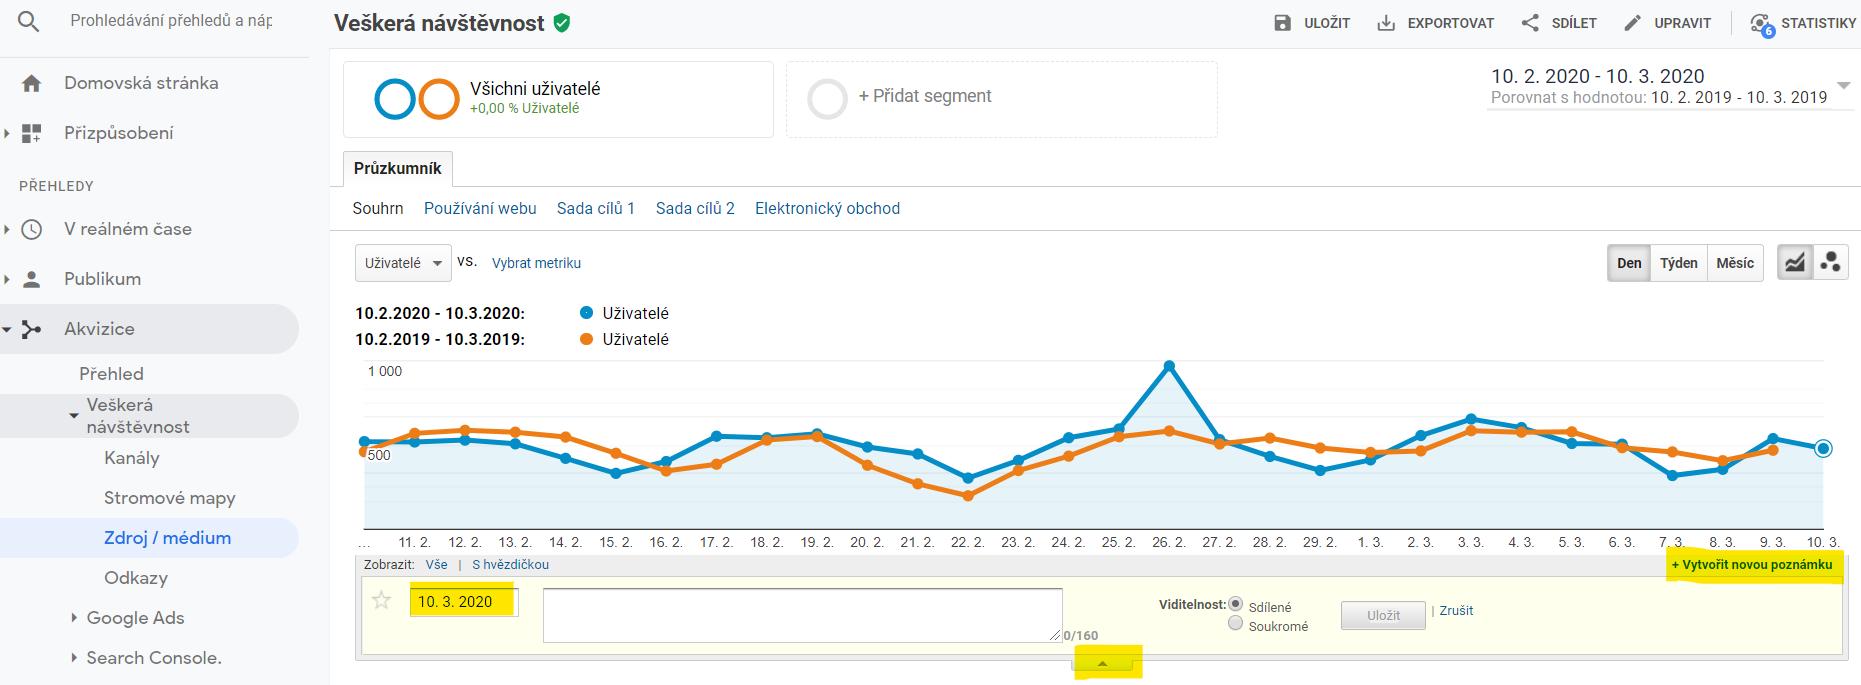 Tvorba poznámek vGoogle Analytics - návod | Žijeme online